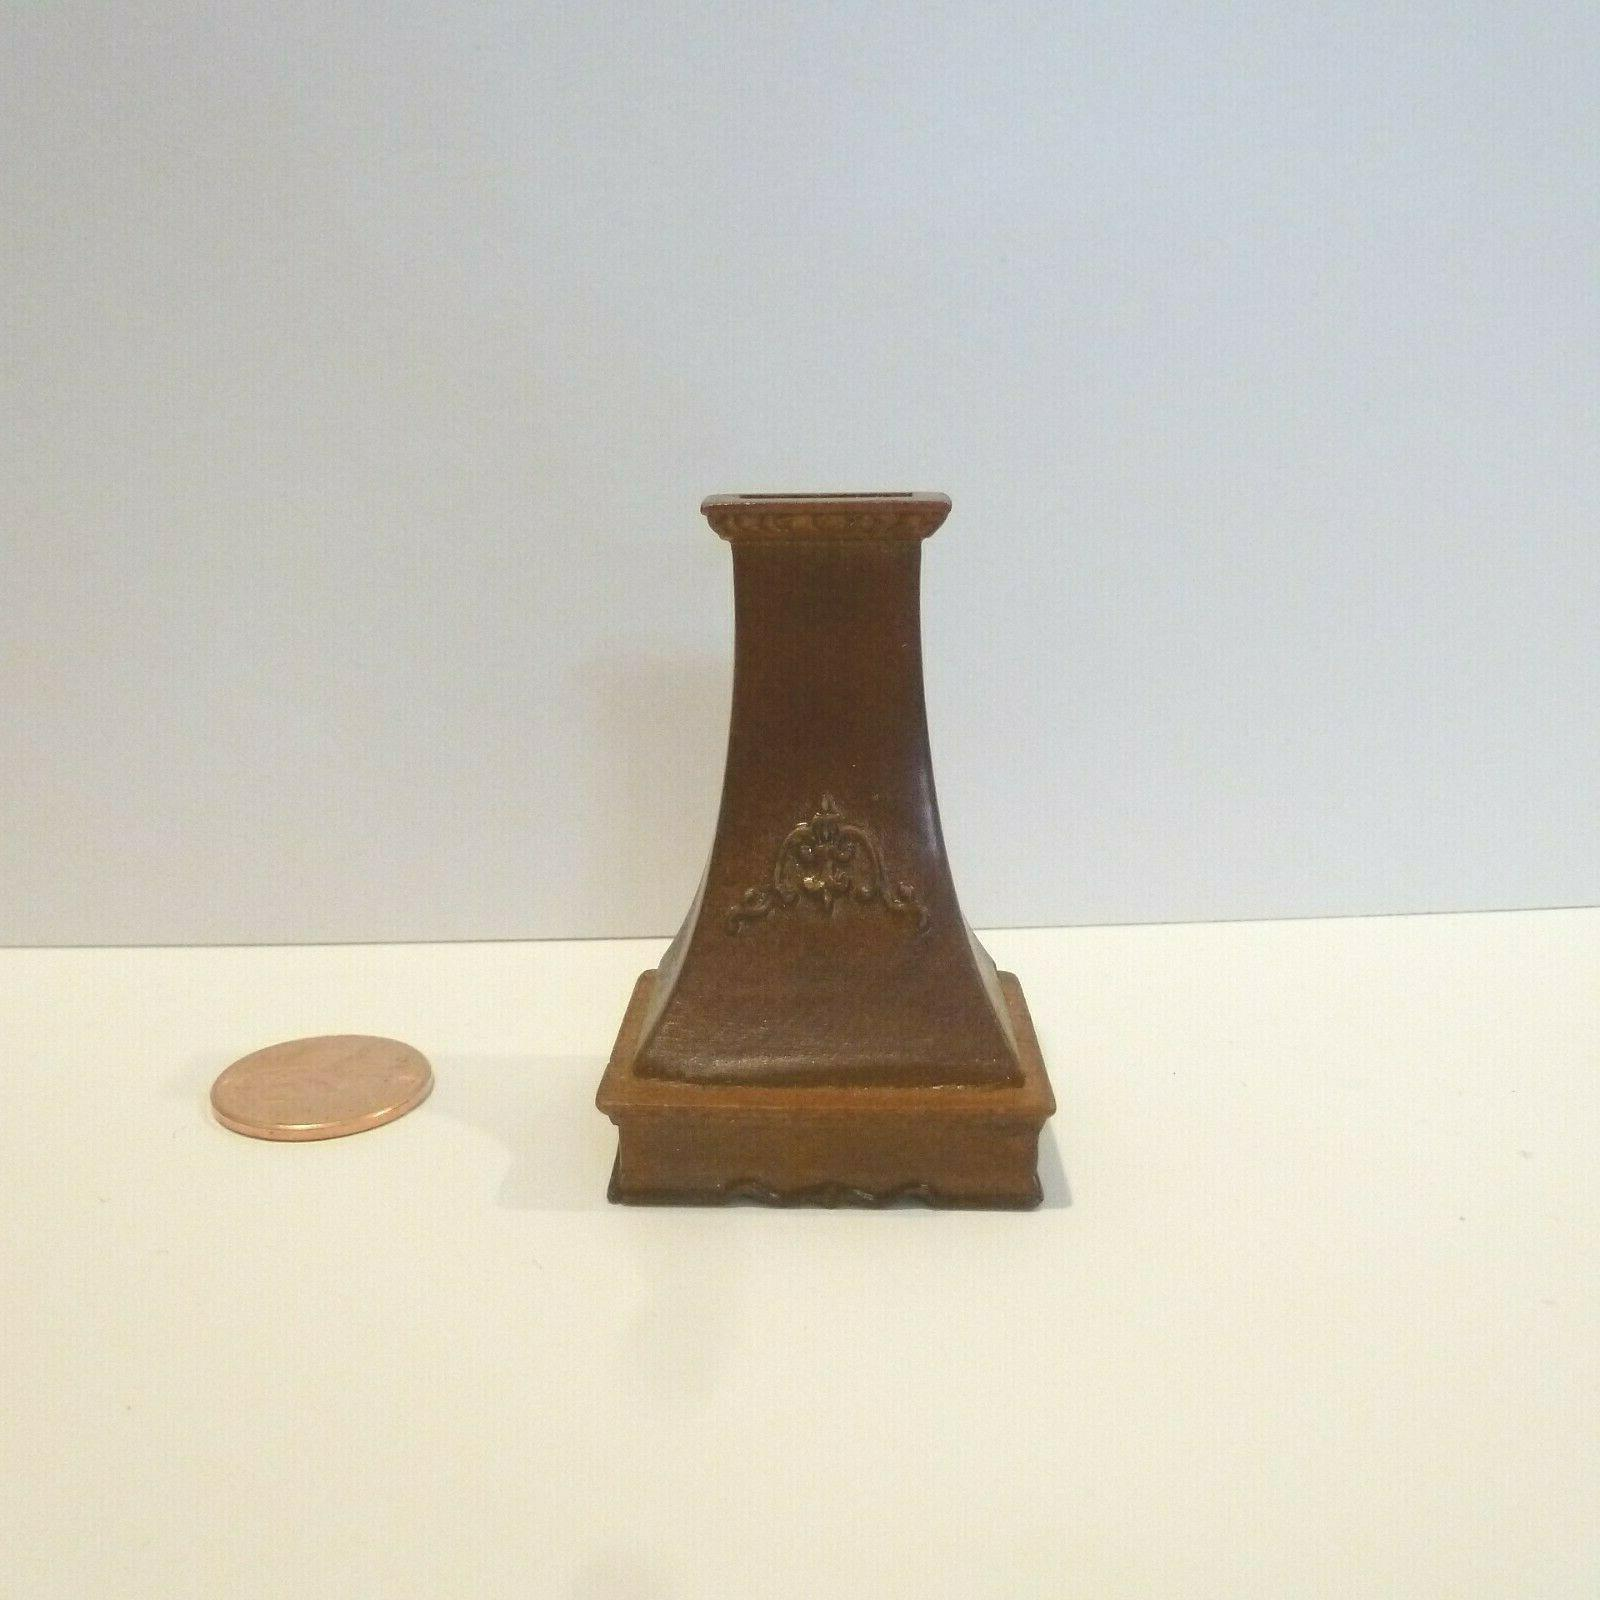 miniature 1 2 scale 1 24 paula